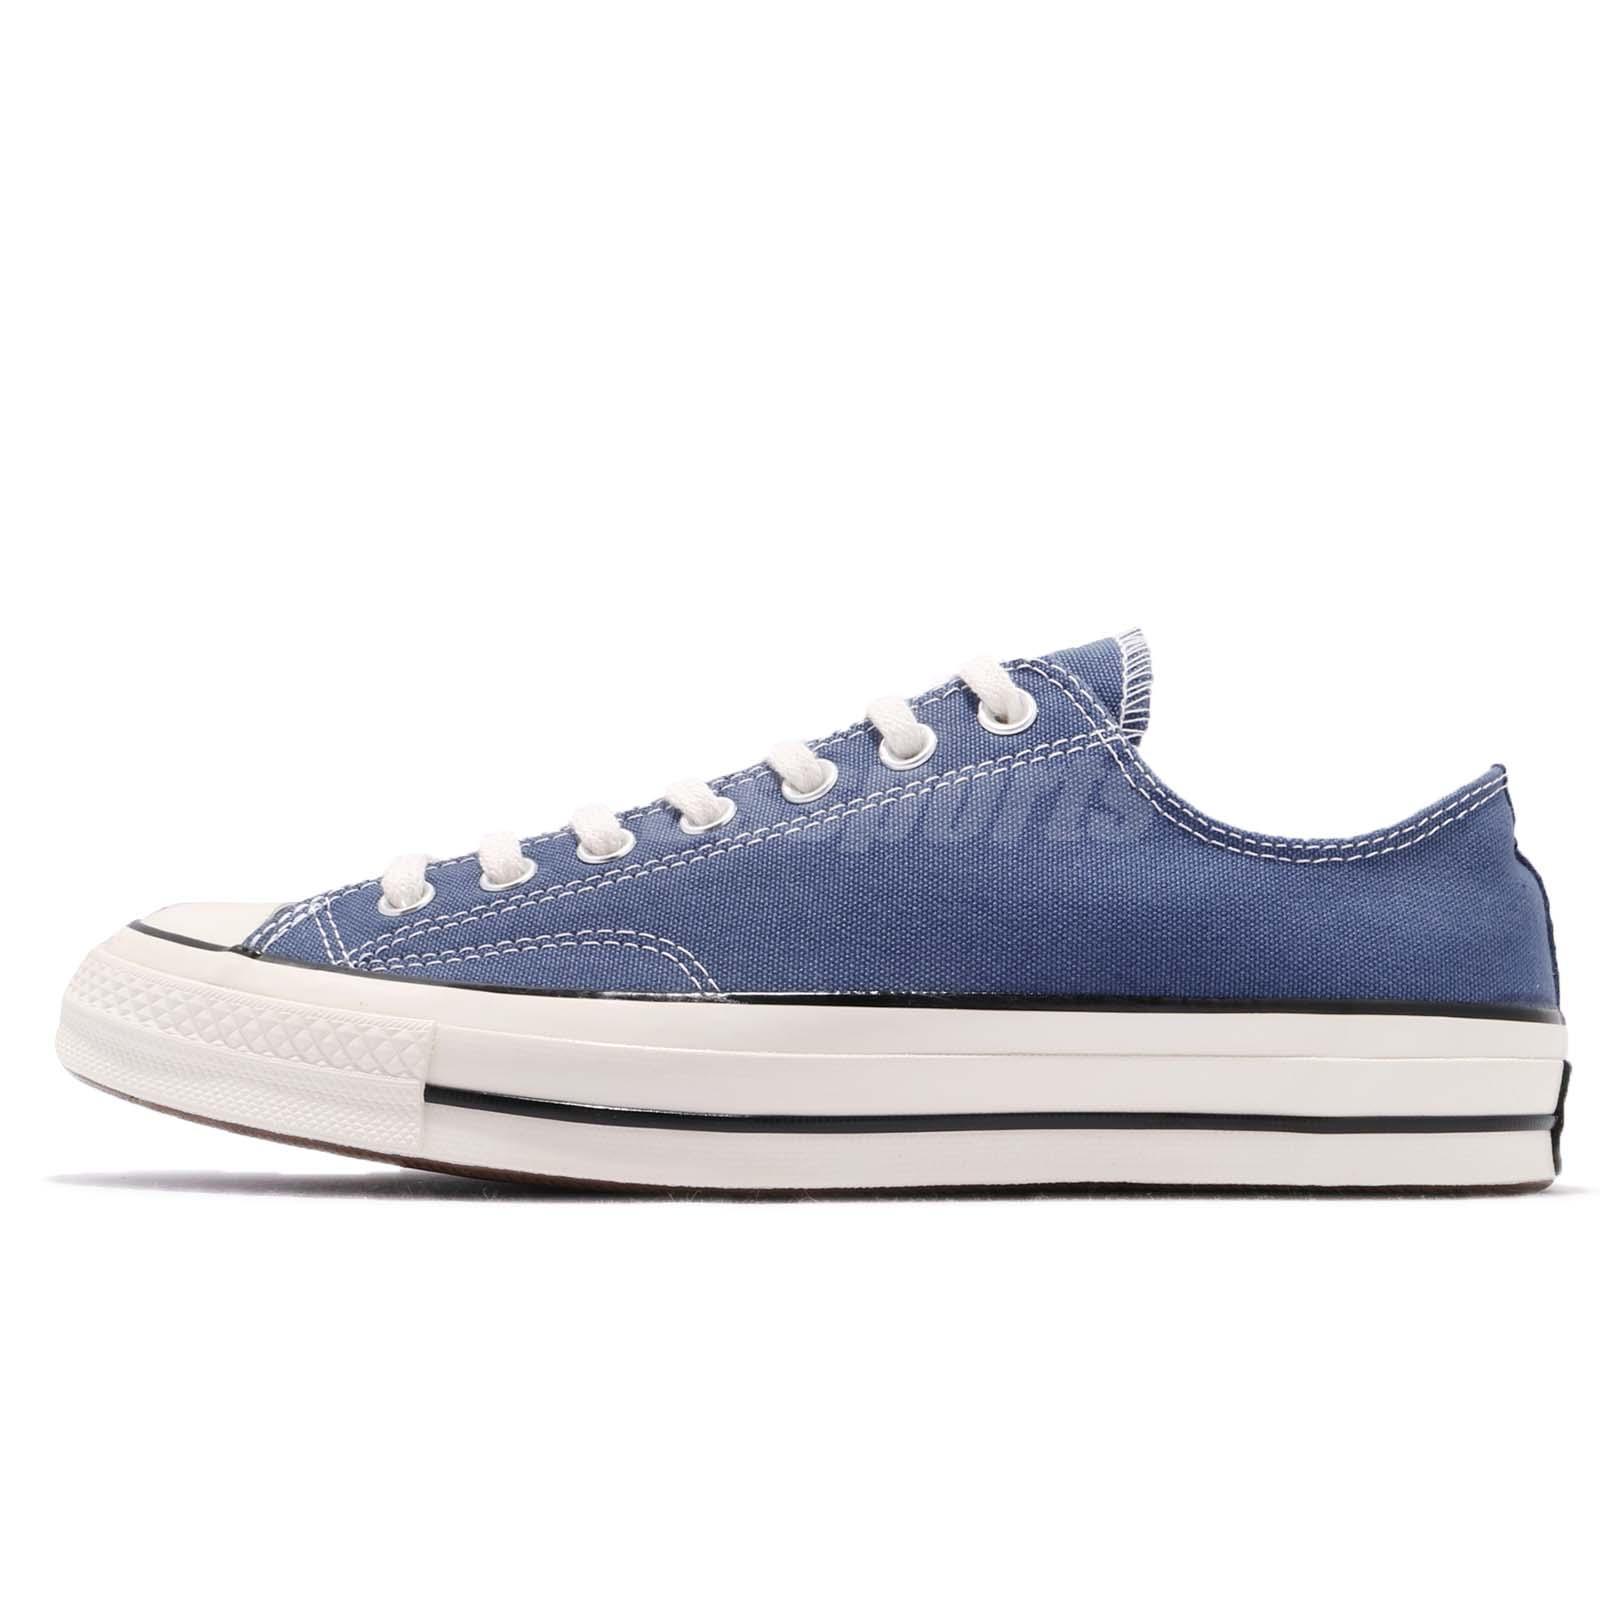 d2265f8f3774 Converse Chuck Taylor All Star 70 1970s OX Navy Blue Canvas Men Shoe 162064C